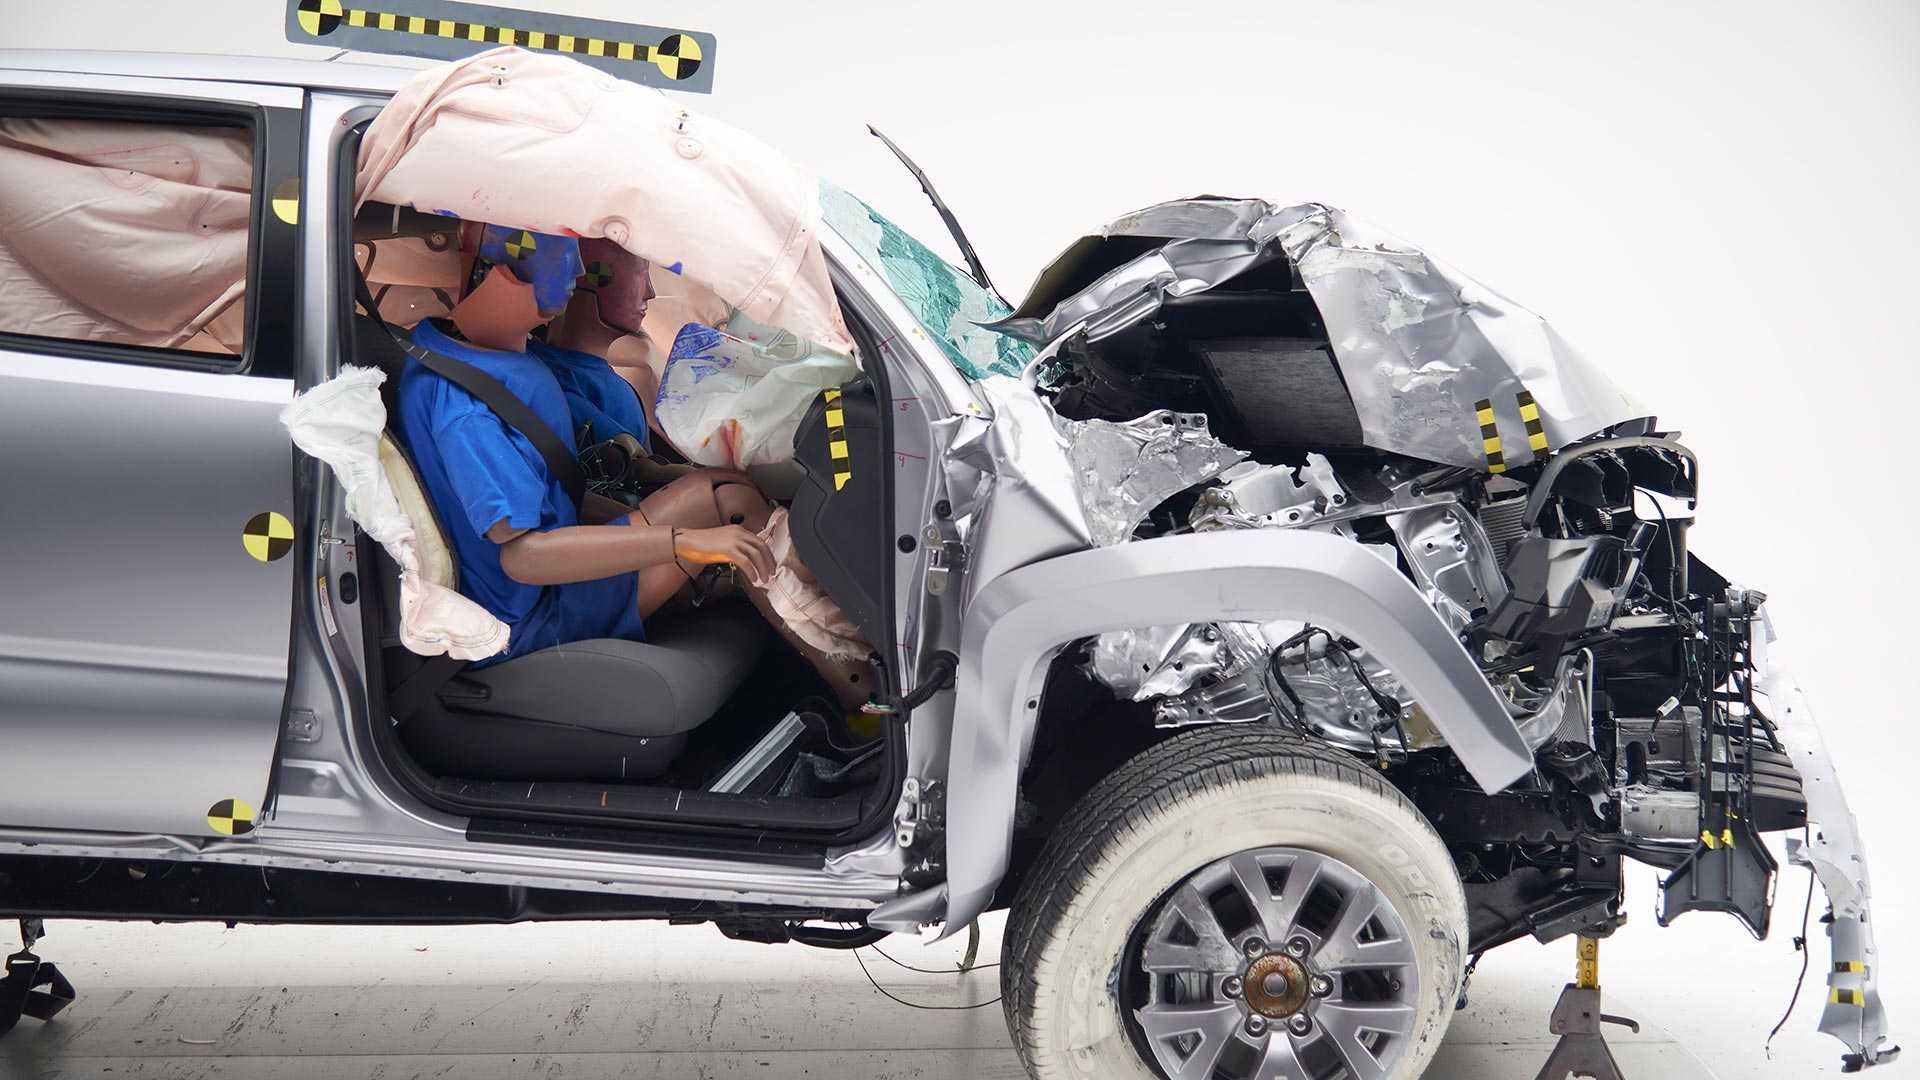 2019-toyota-tacoma-double-cab-crash-test (2)